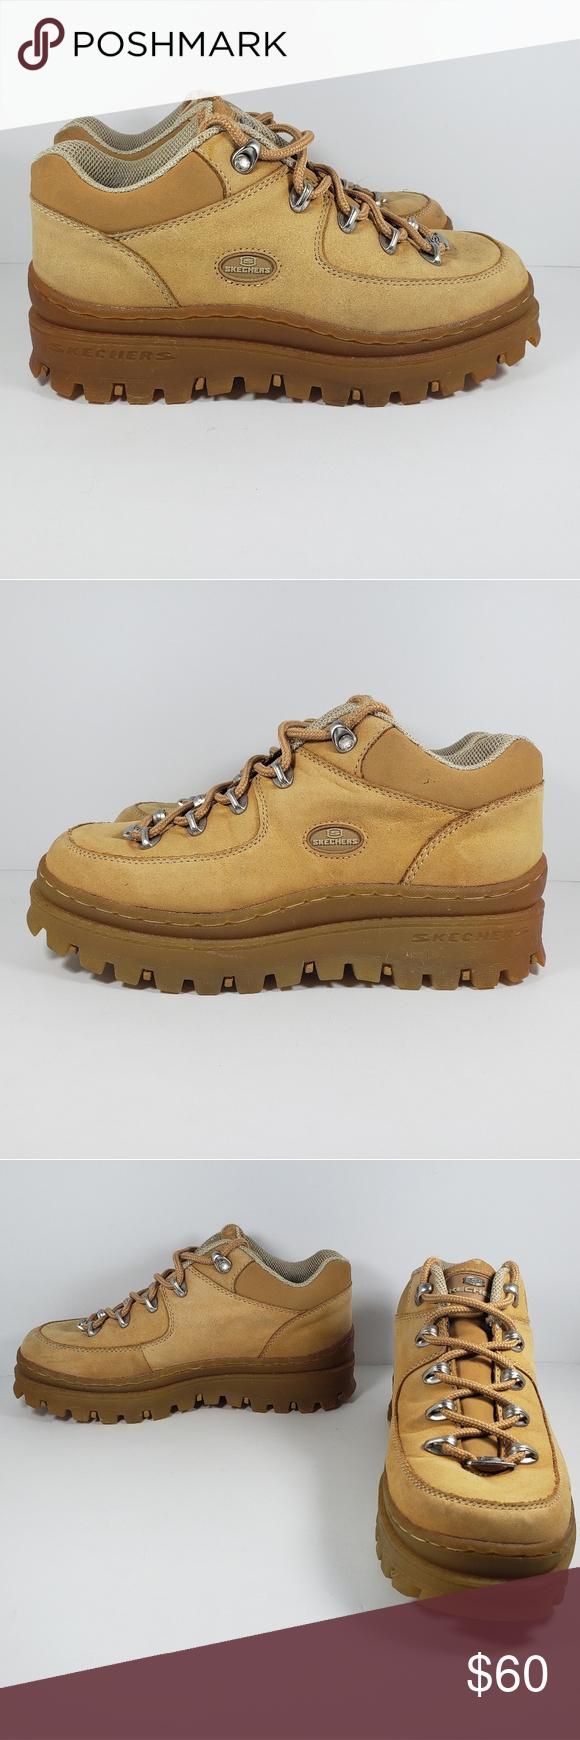 Skechers Jammers Hiking Shoes Sn 2634 Womens Sz 10 Skechers